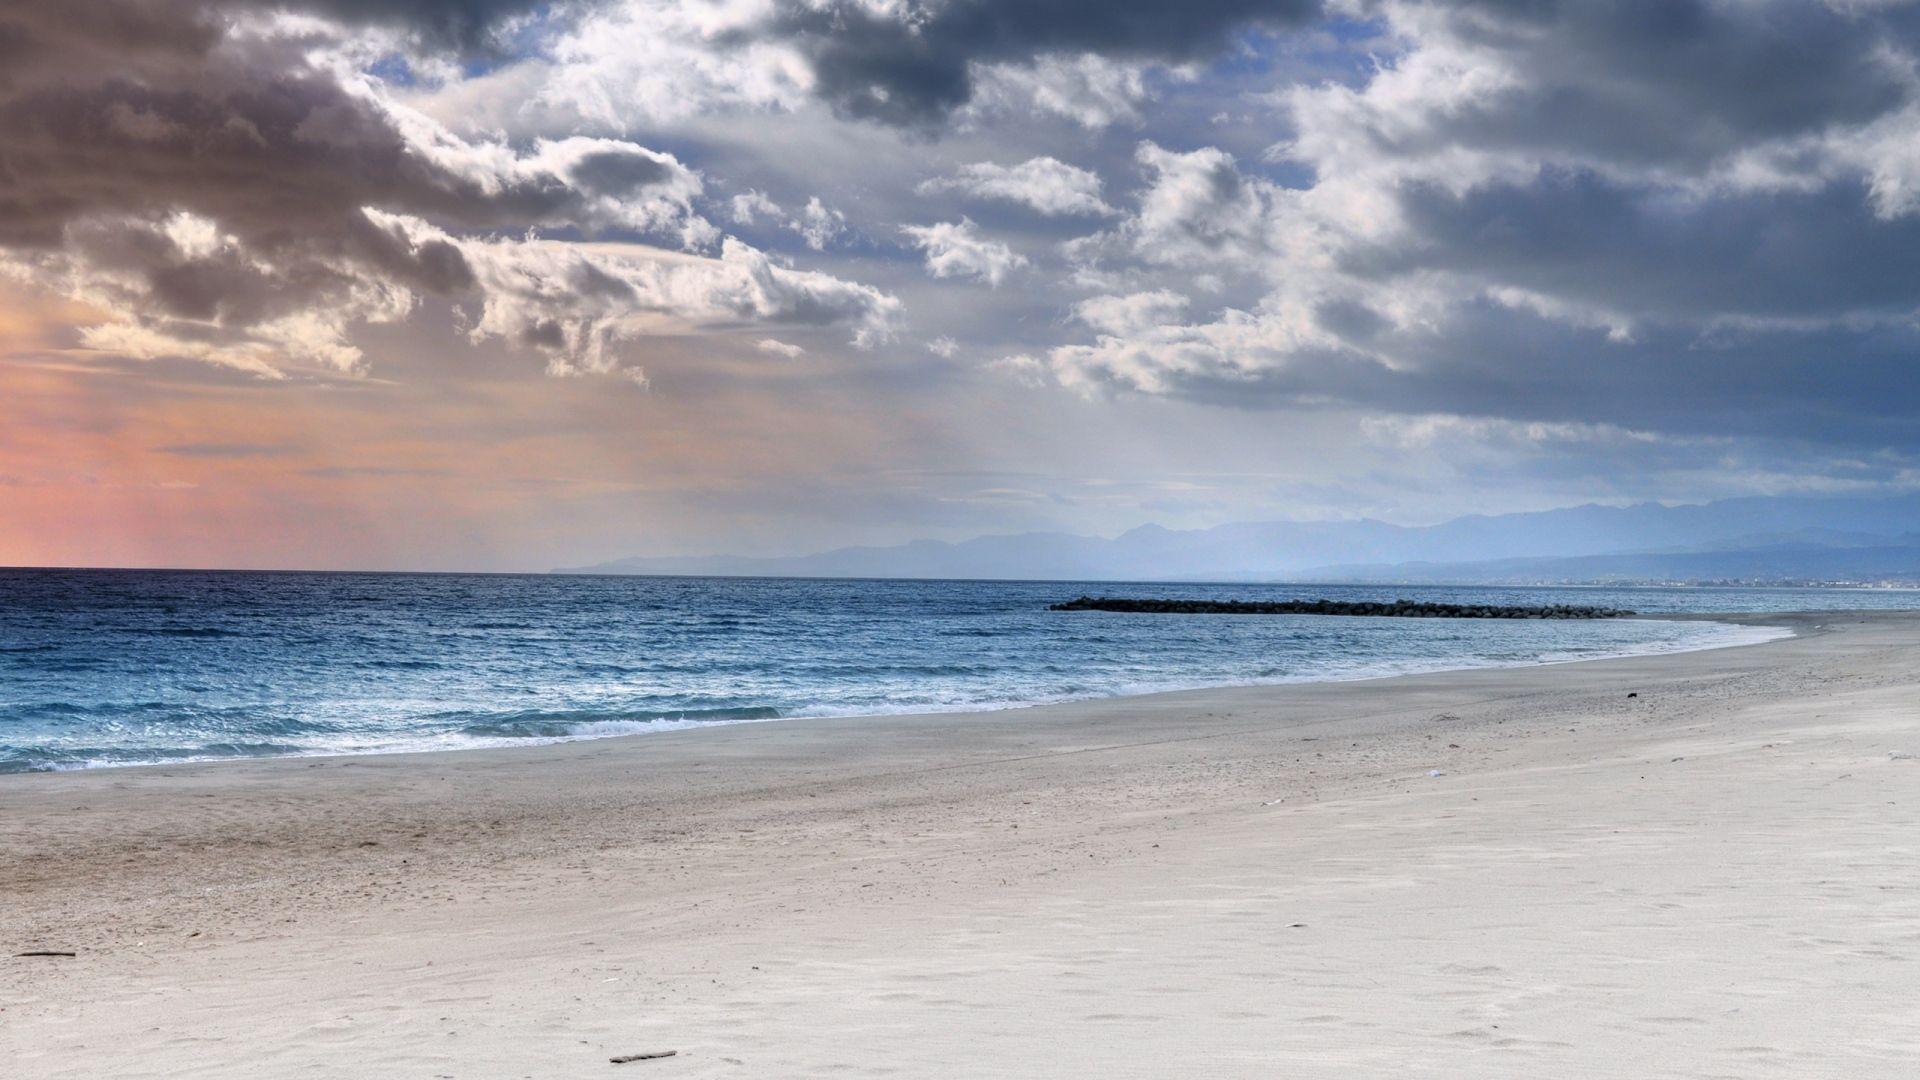 1920x1080 Hd Beach Desktop Wallpapers Top Free 1920x1080 Hd Beach